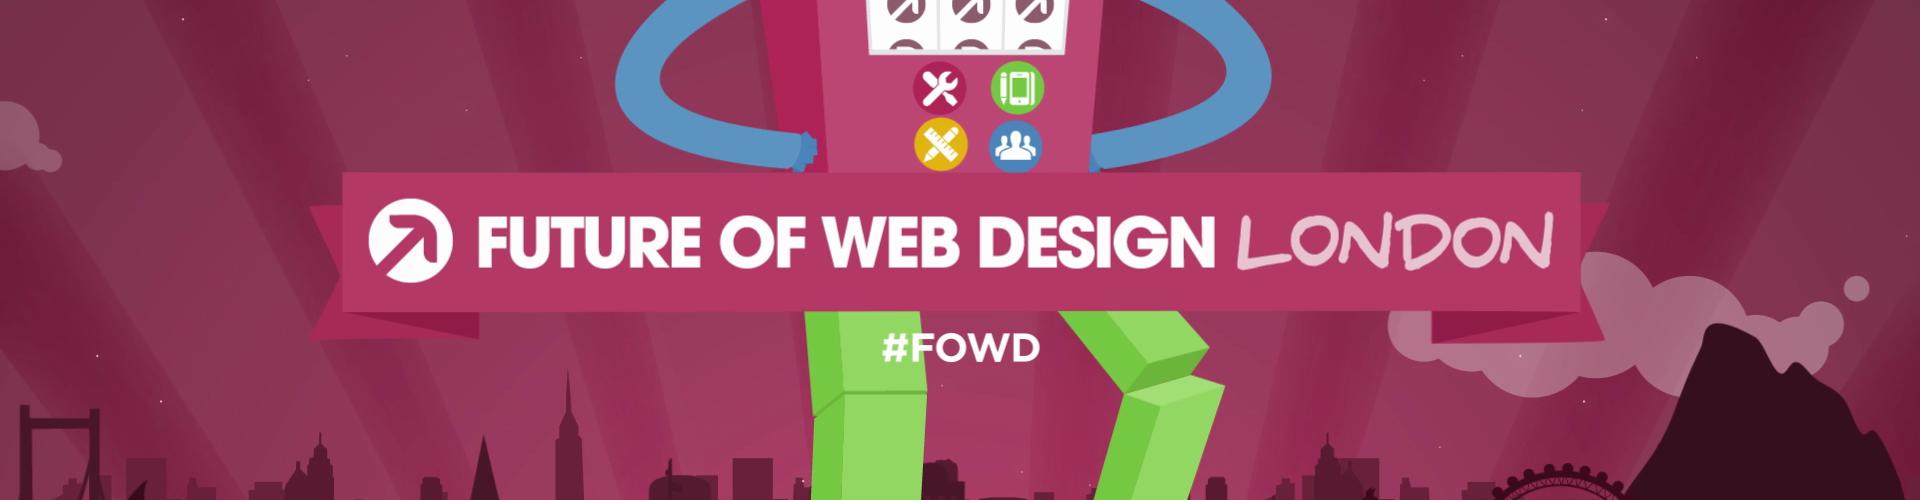 future-of-web-design-techblogcorner-2